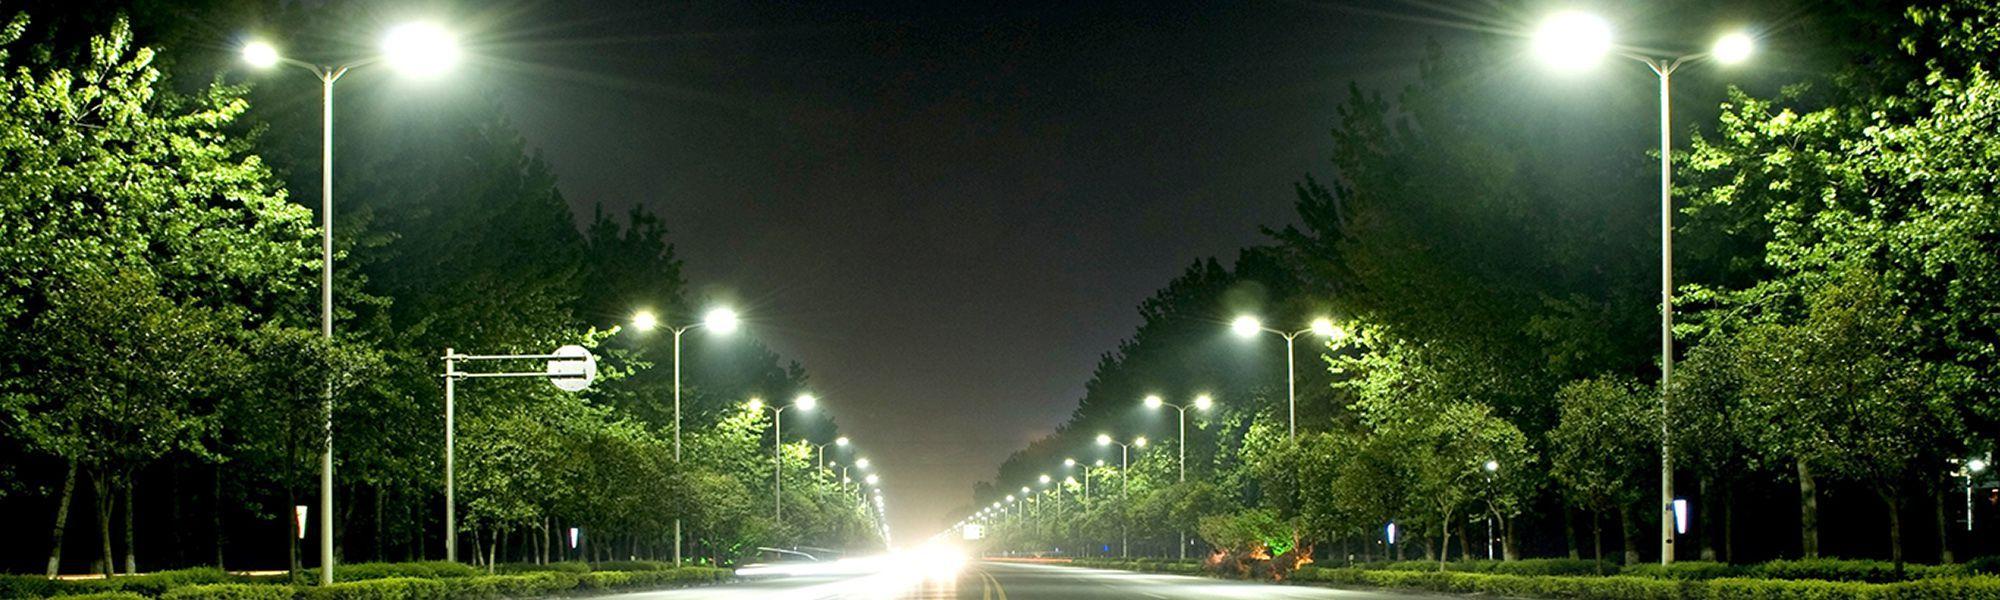 Illuminazioni stradale